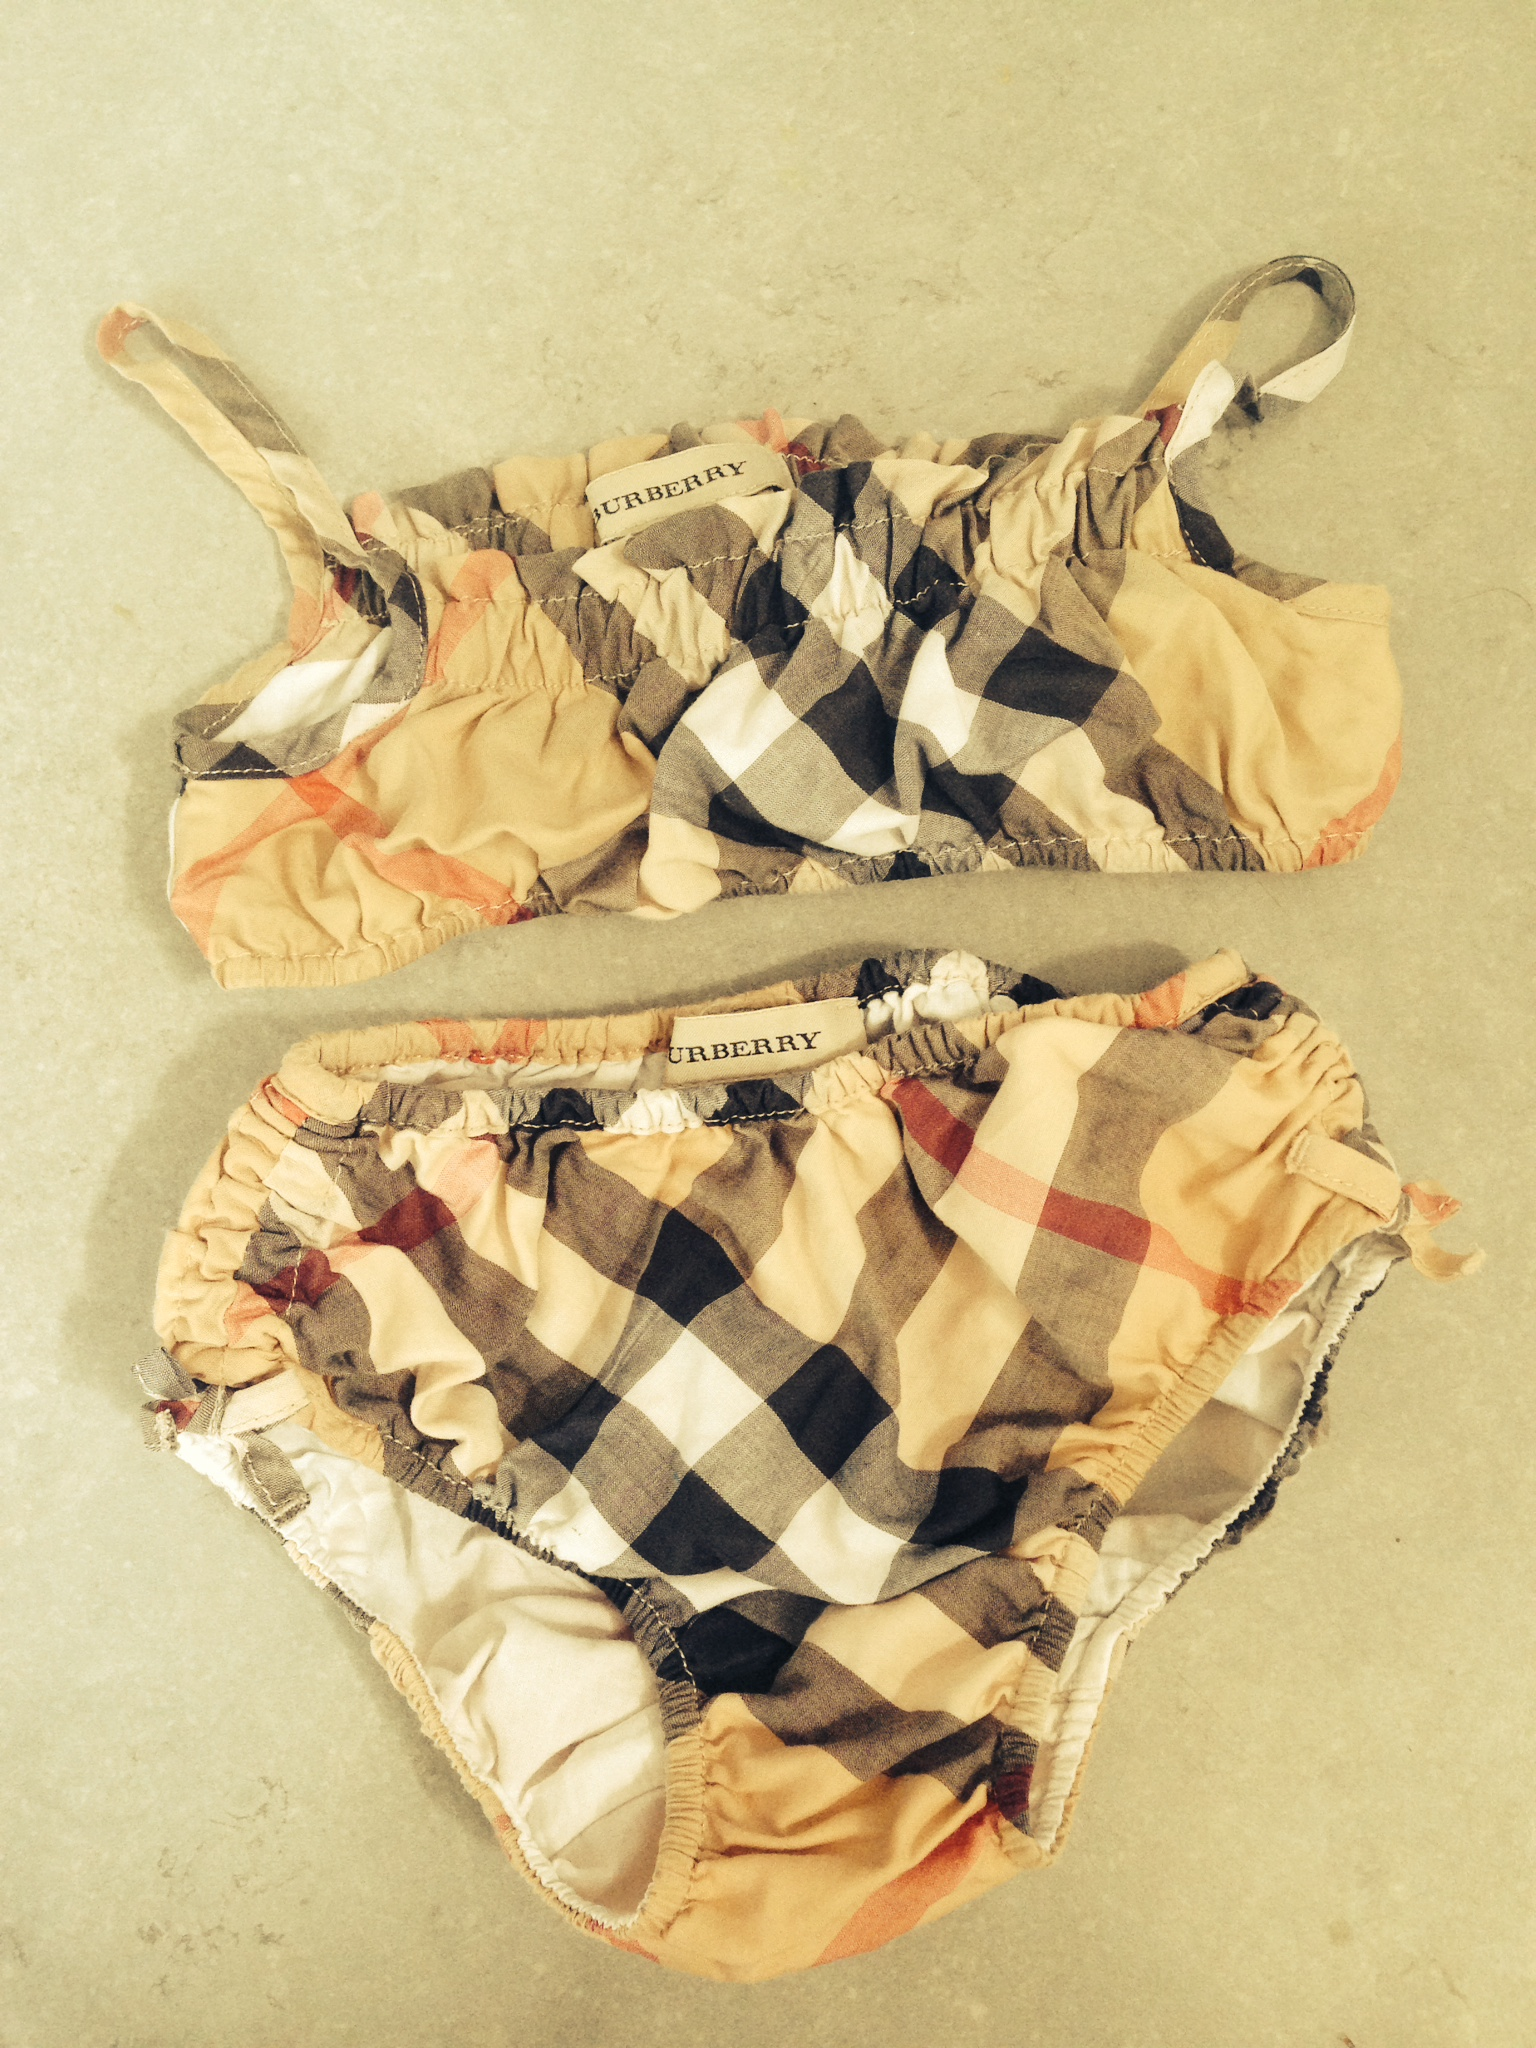 f5755a9e217 Vente en gros maillot bain burberry pas cher Pas cher - commulangues.be